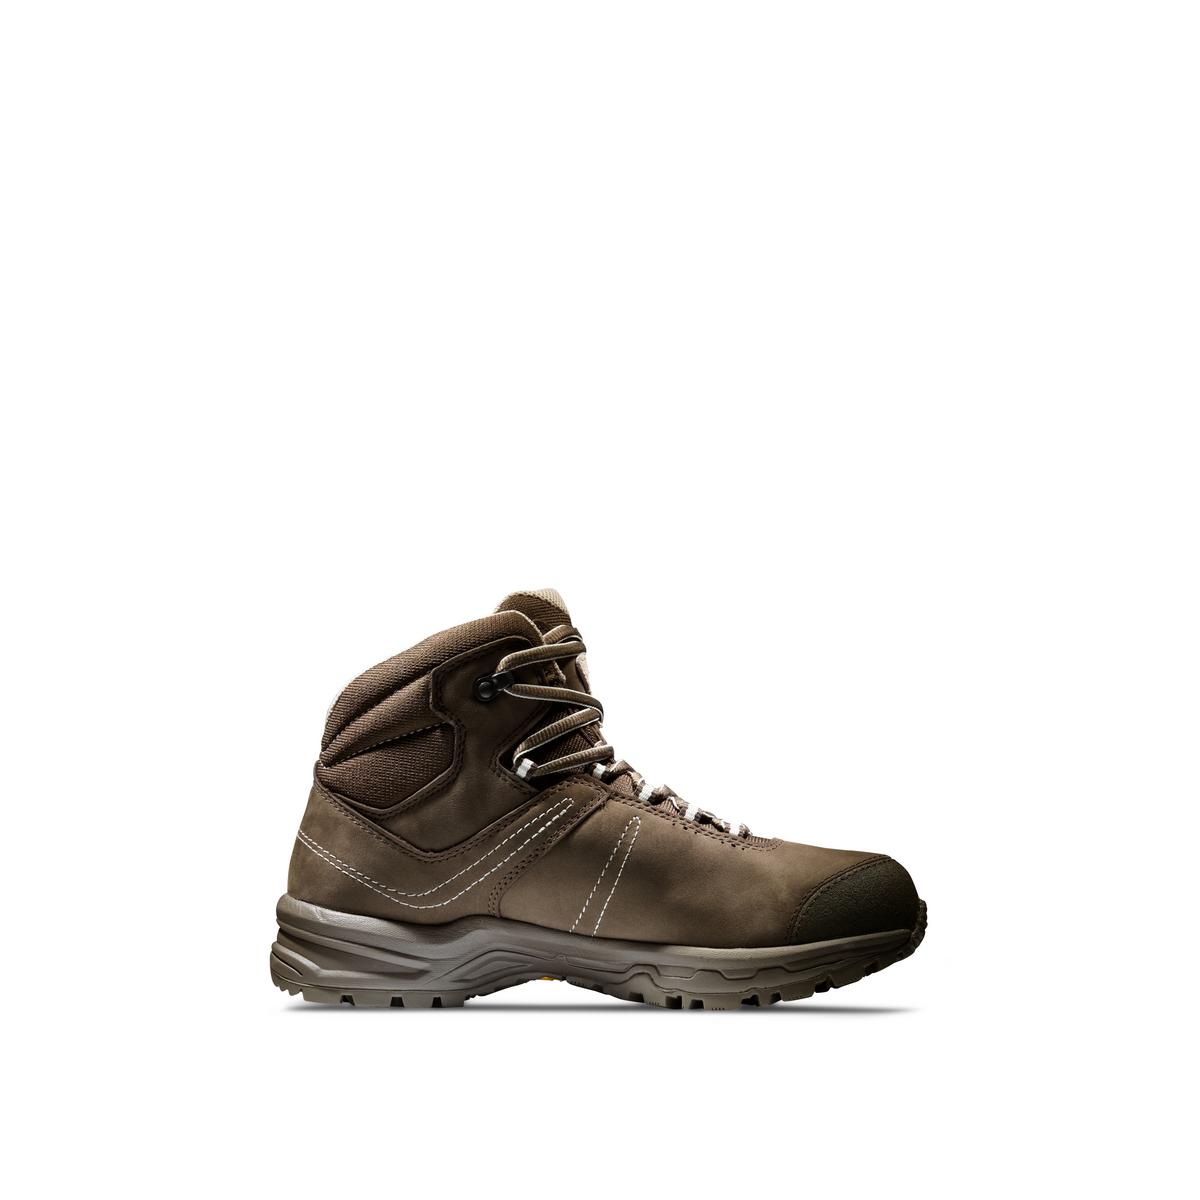 RRP £160 Mammut Womens Nova III Mid GTX Waterproof Walking// Hiking Boots UK 6.5